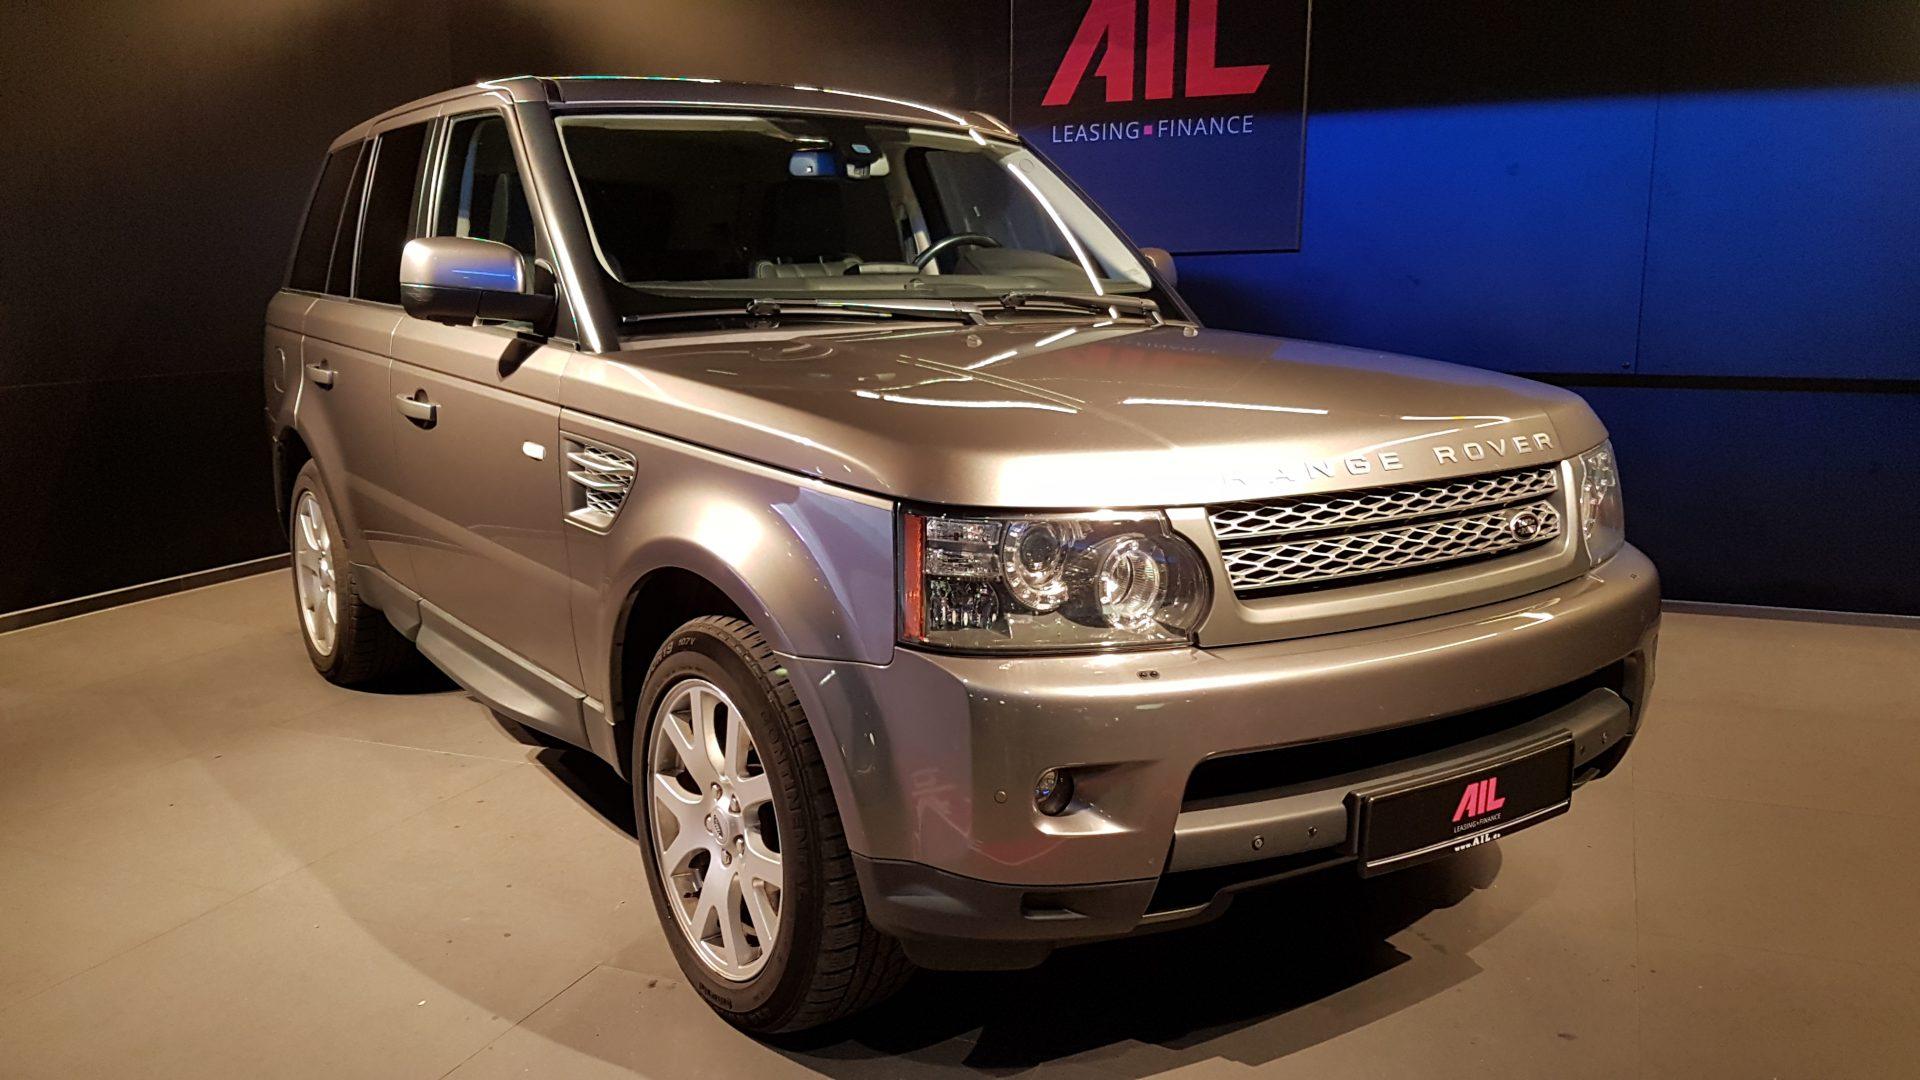 AIL Land Rover Range Rover Sport TDV8 HSE 10